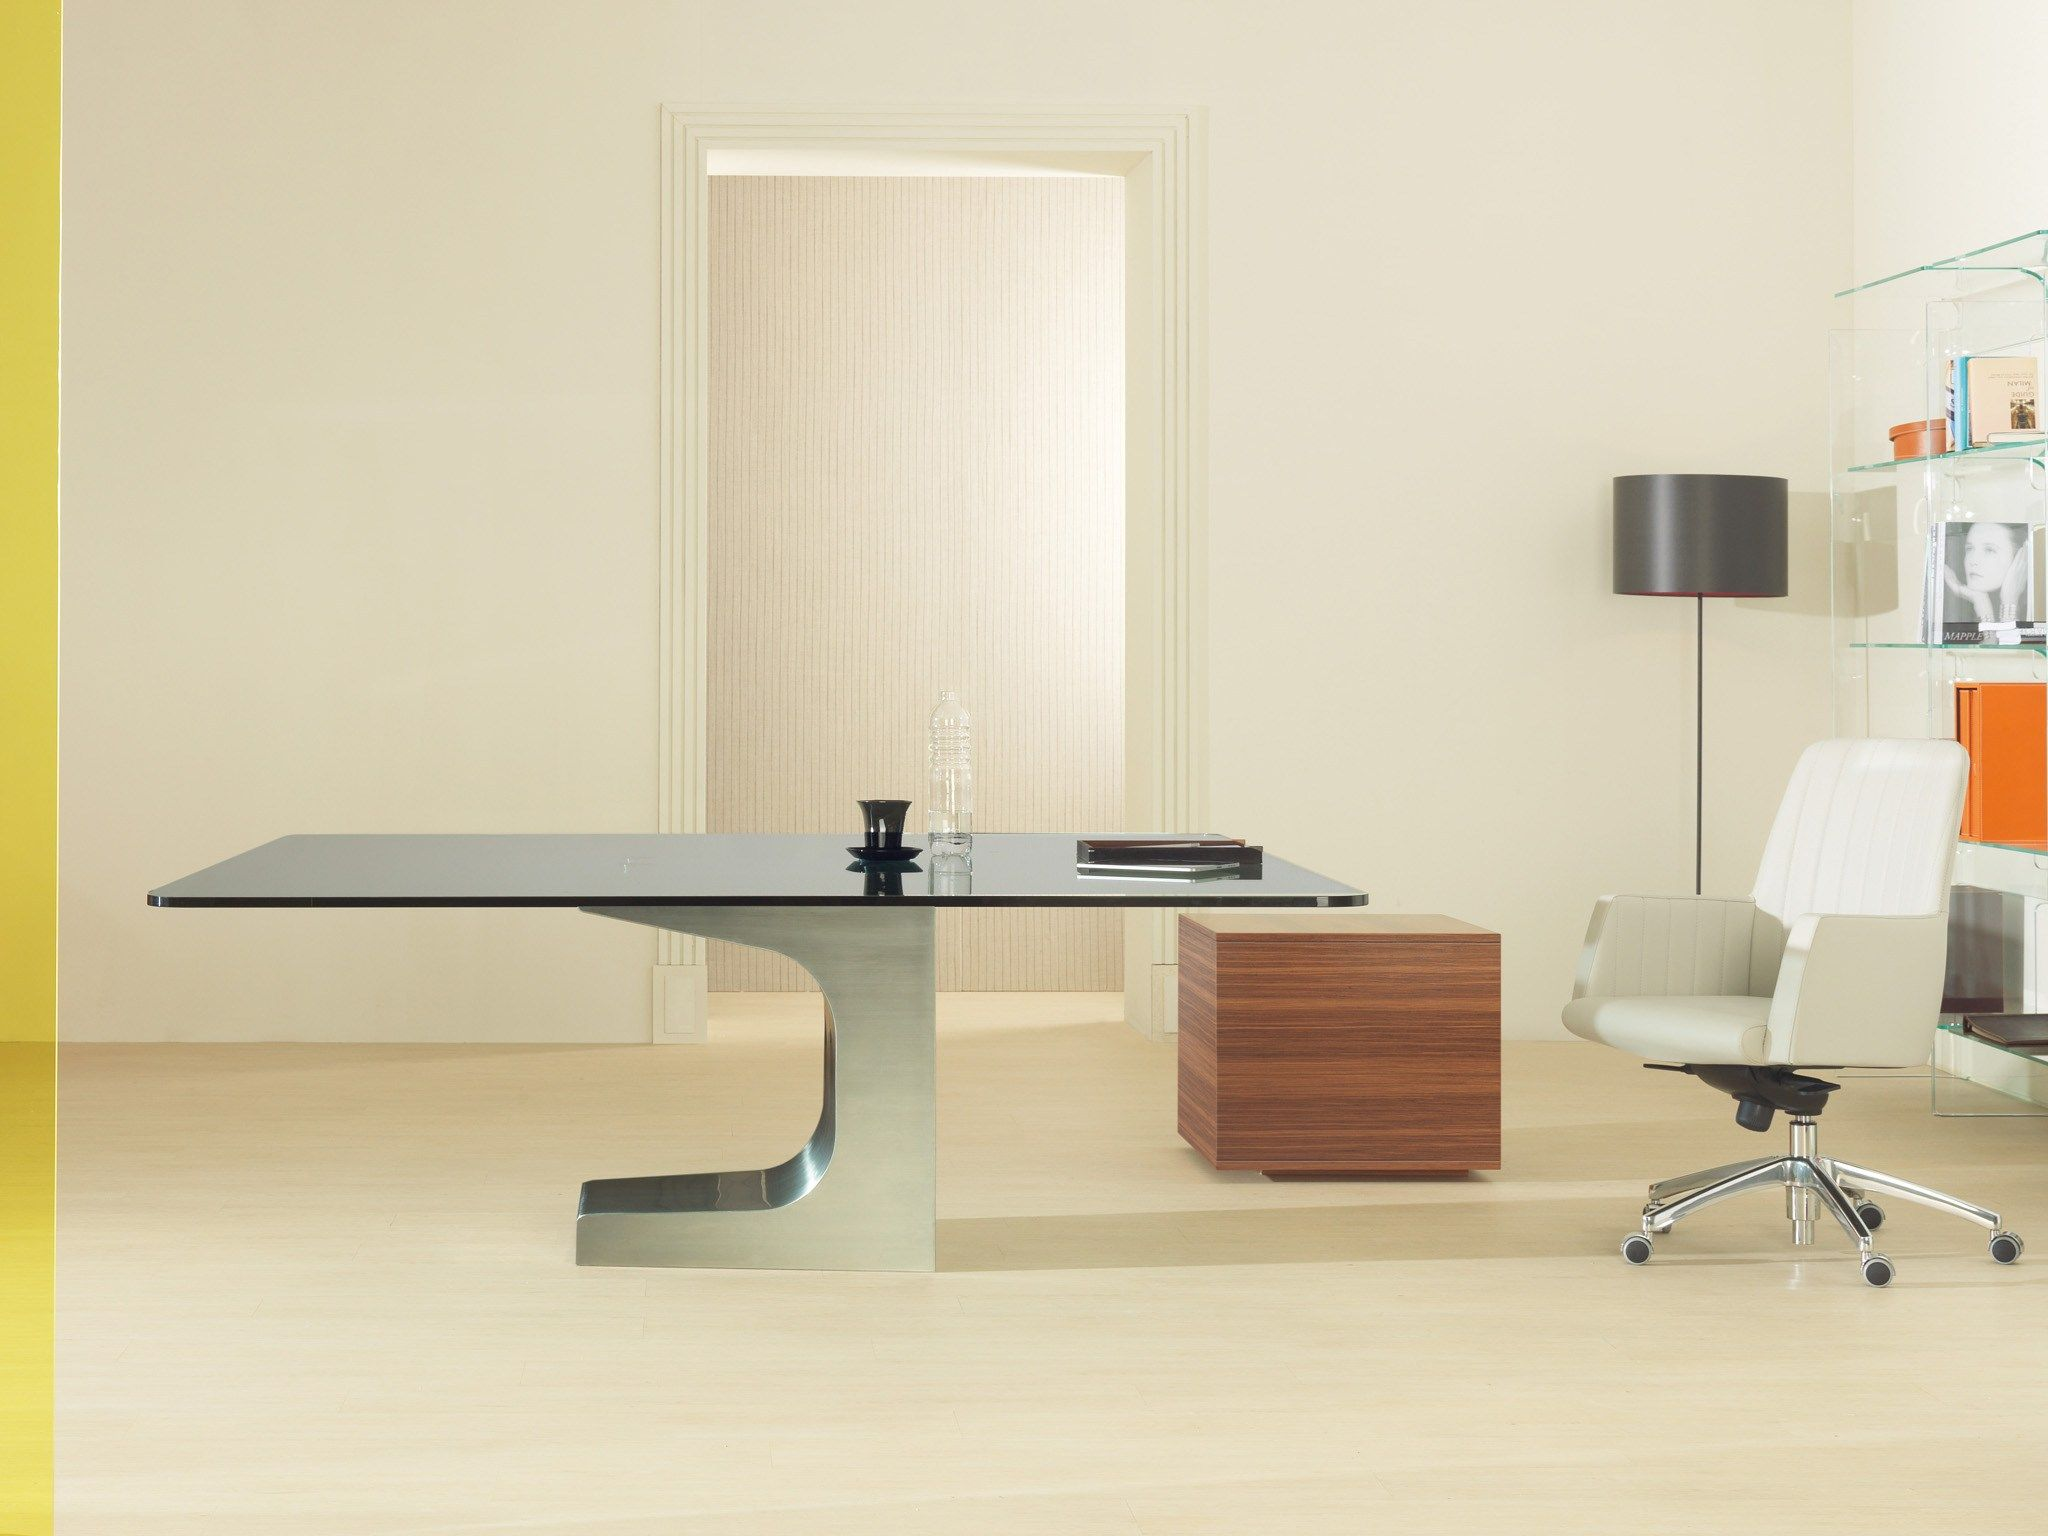 Square glass table NIEMEYER by ESTEL GROUP   design Oscar ...